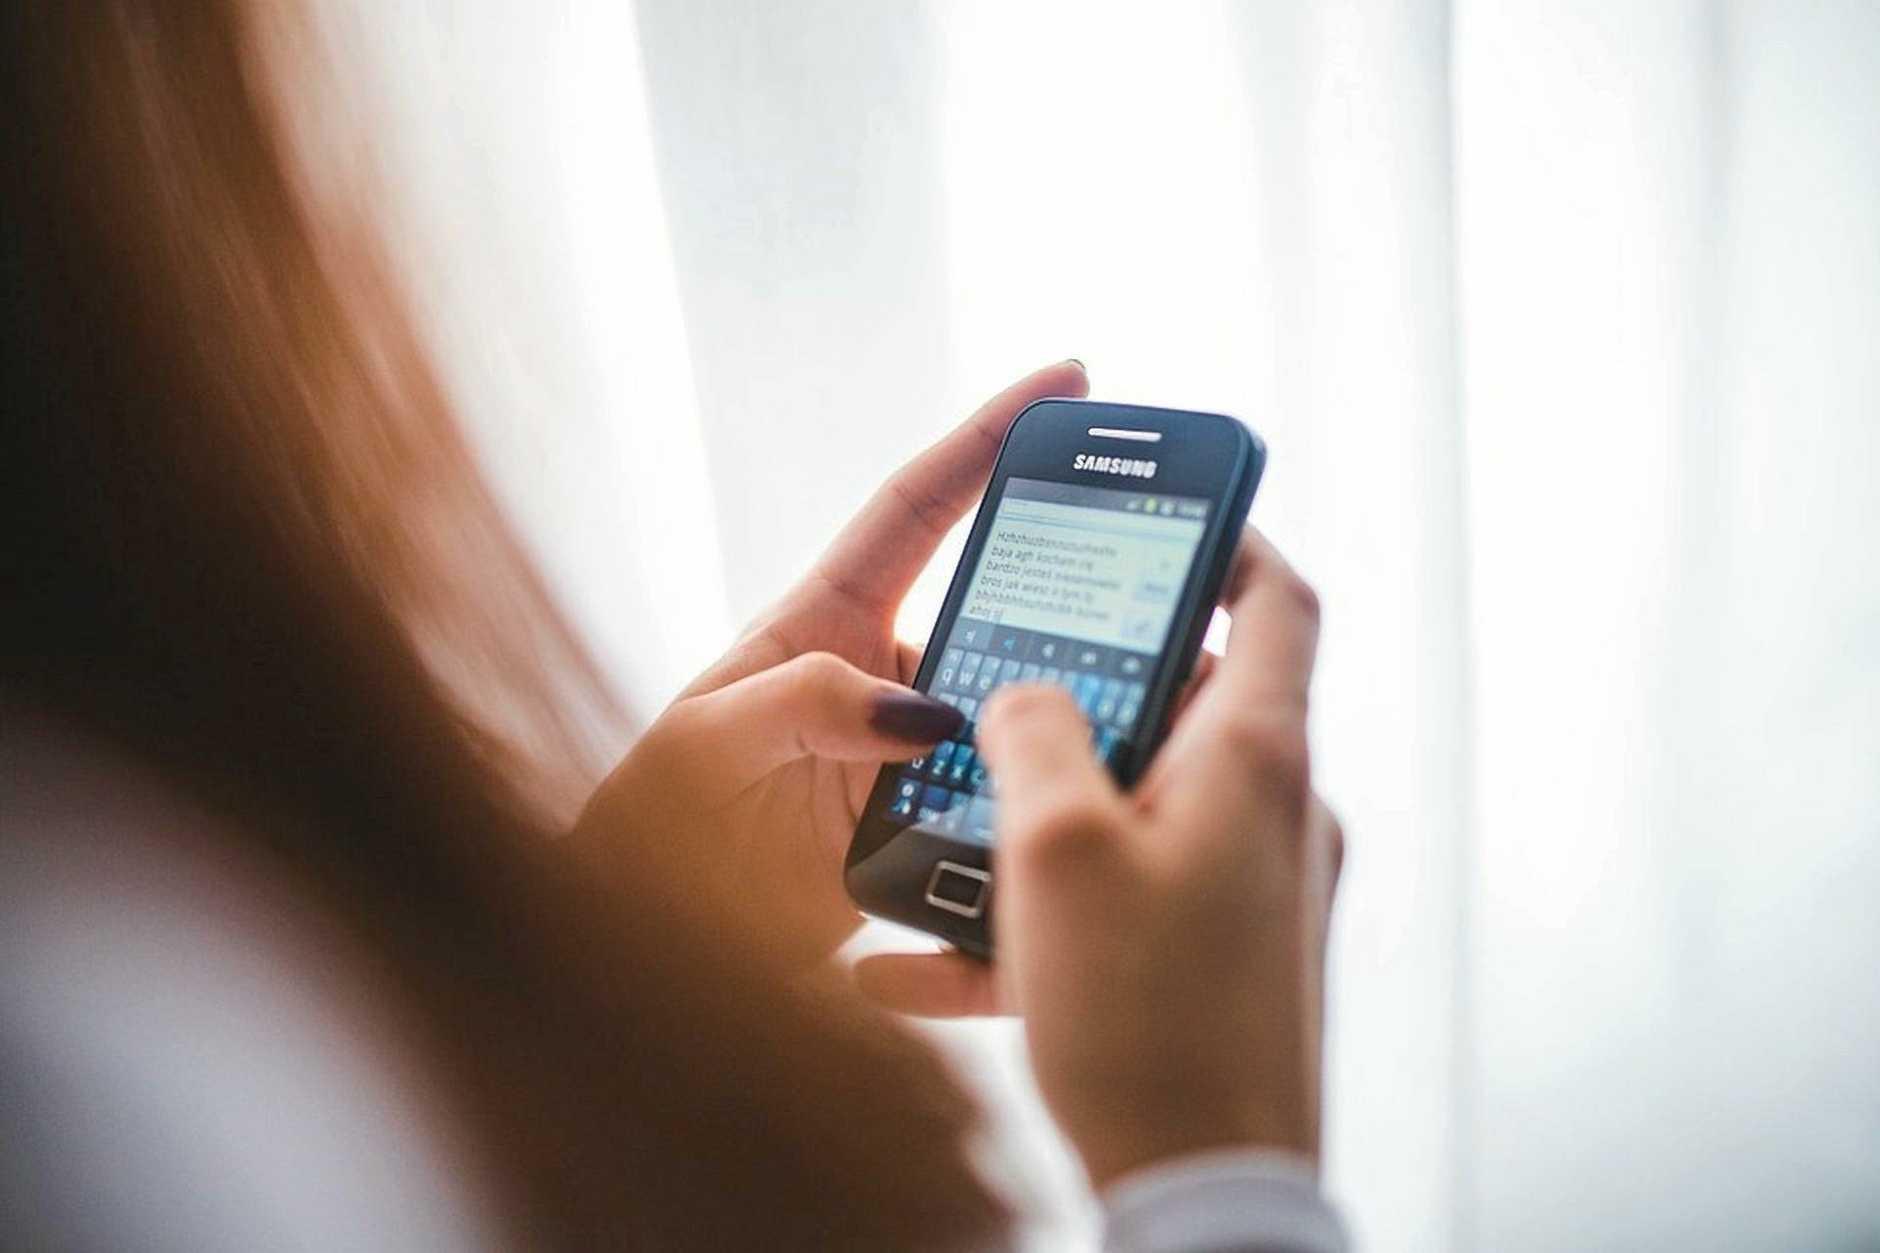 phone generic mobile phone smartphone girl